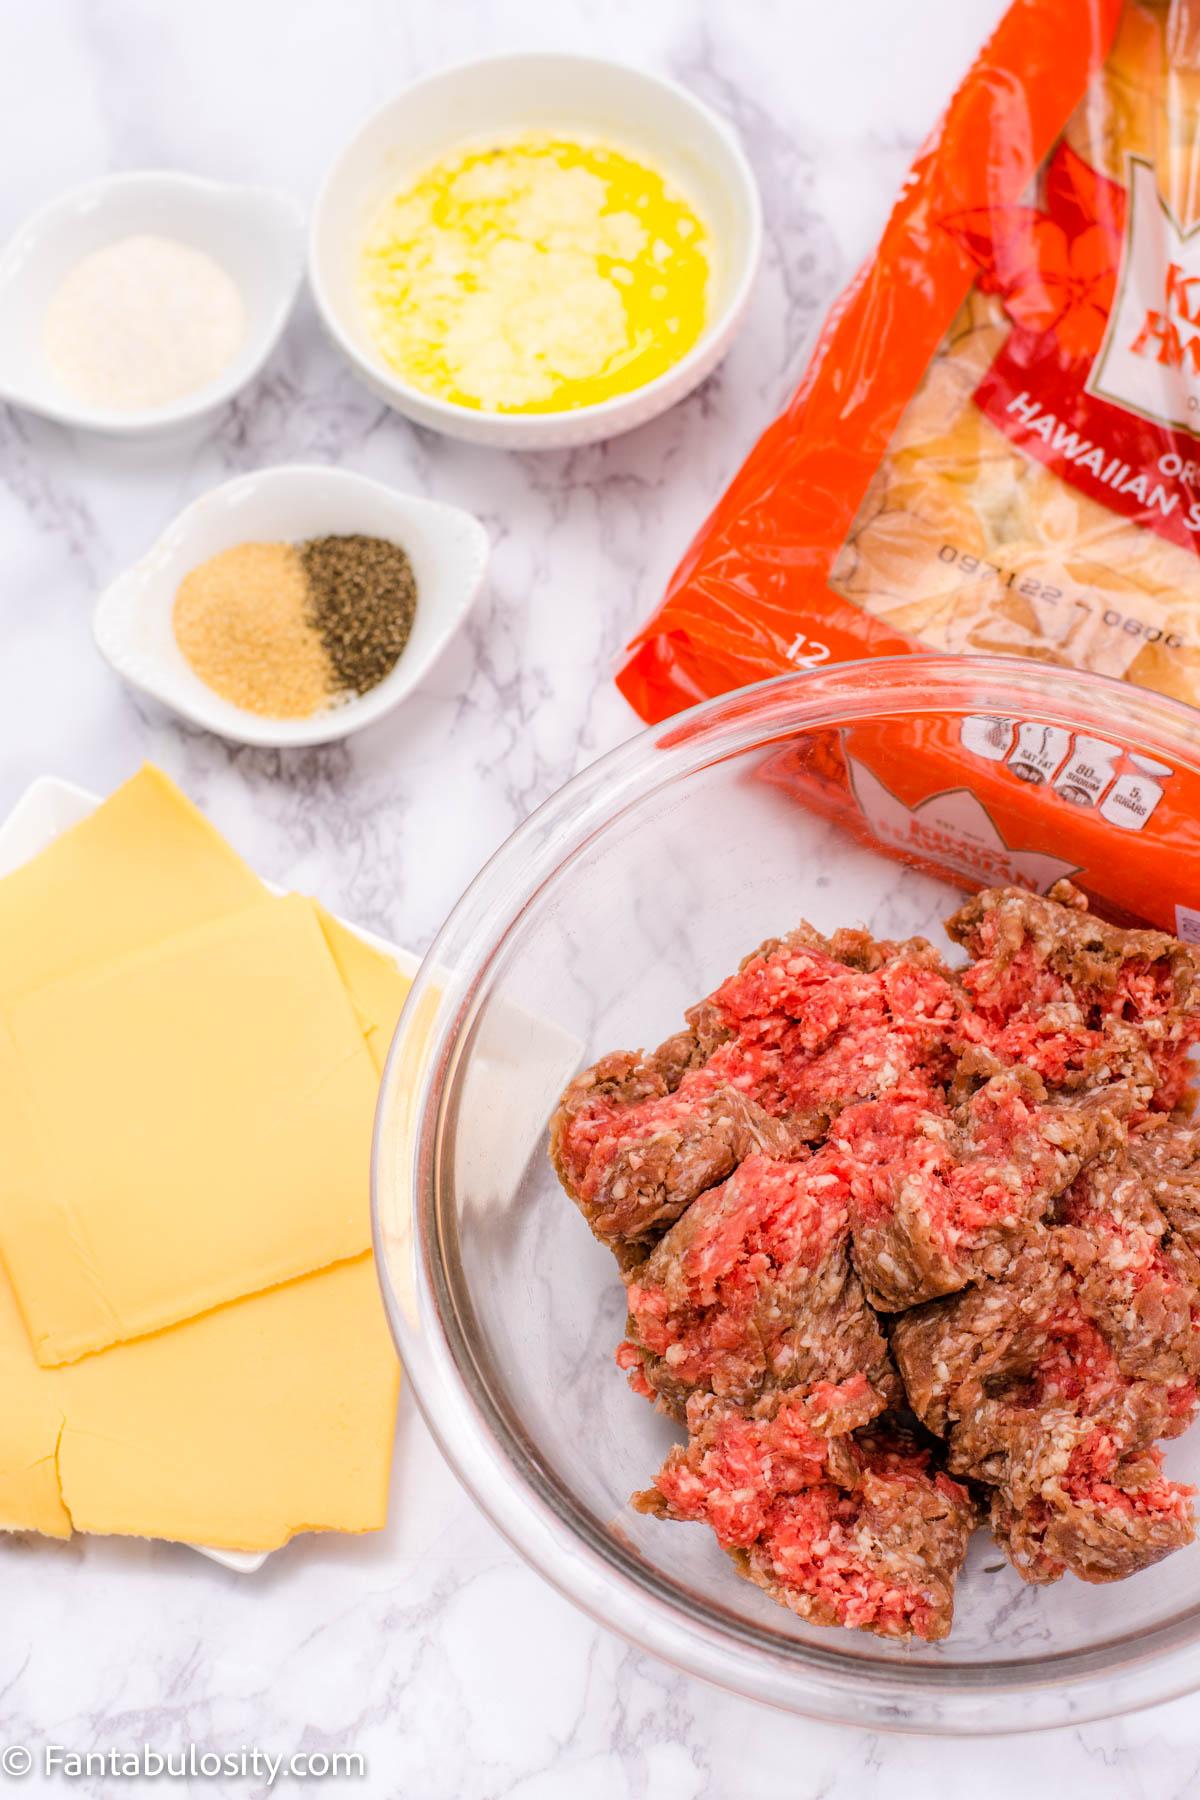 Ingredients for burger sliders